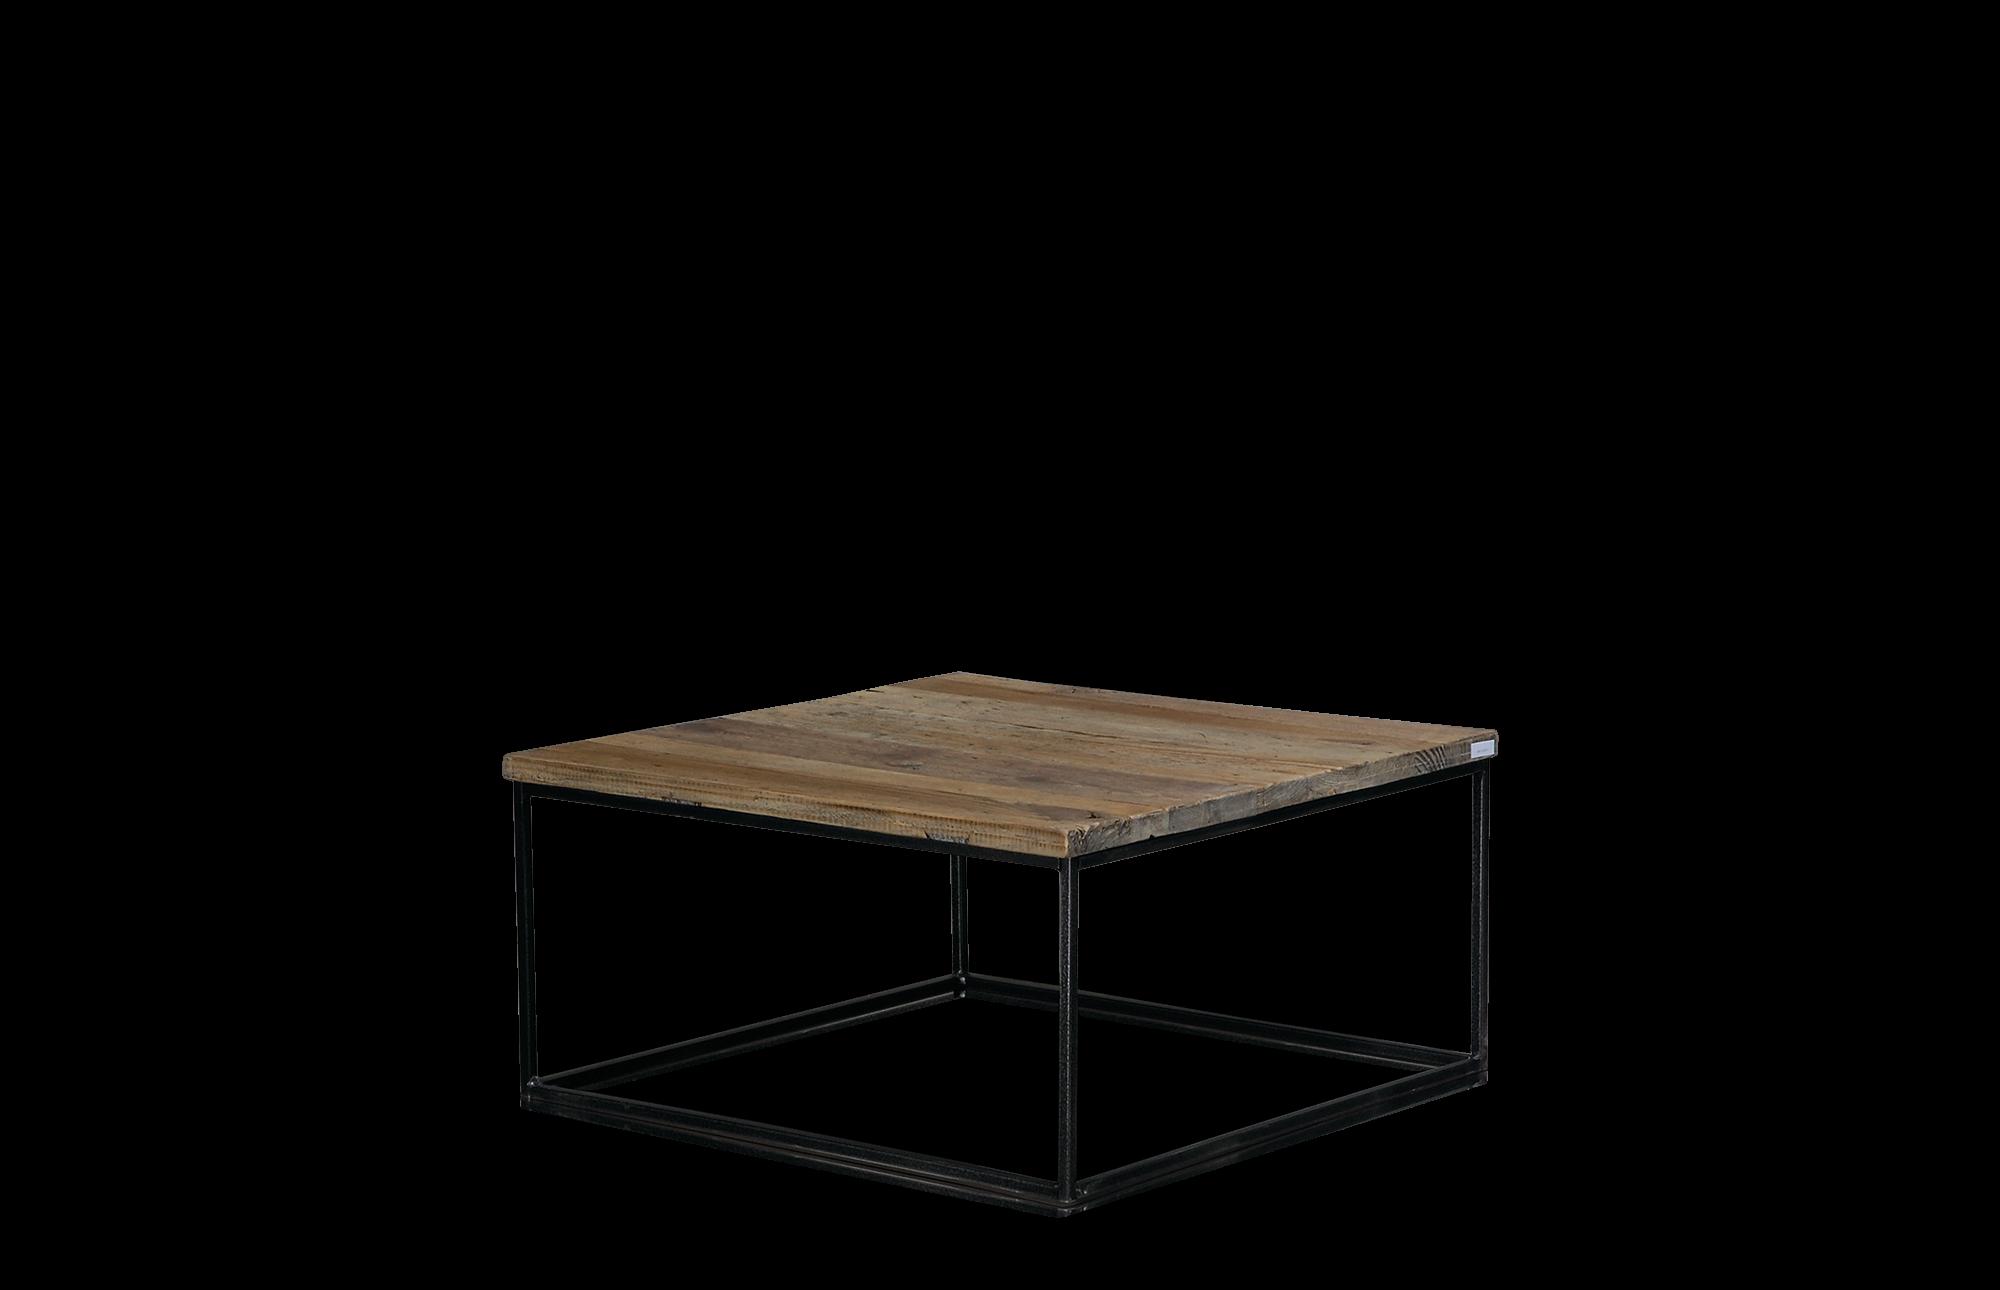 45f189611d88f0f4f3282fd4e519fbdd Frais De Table Basse Design Transparente Conception